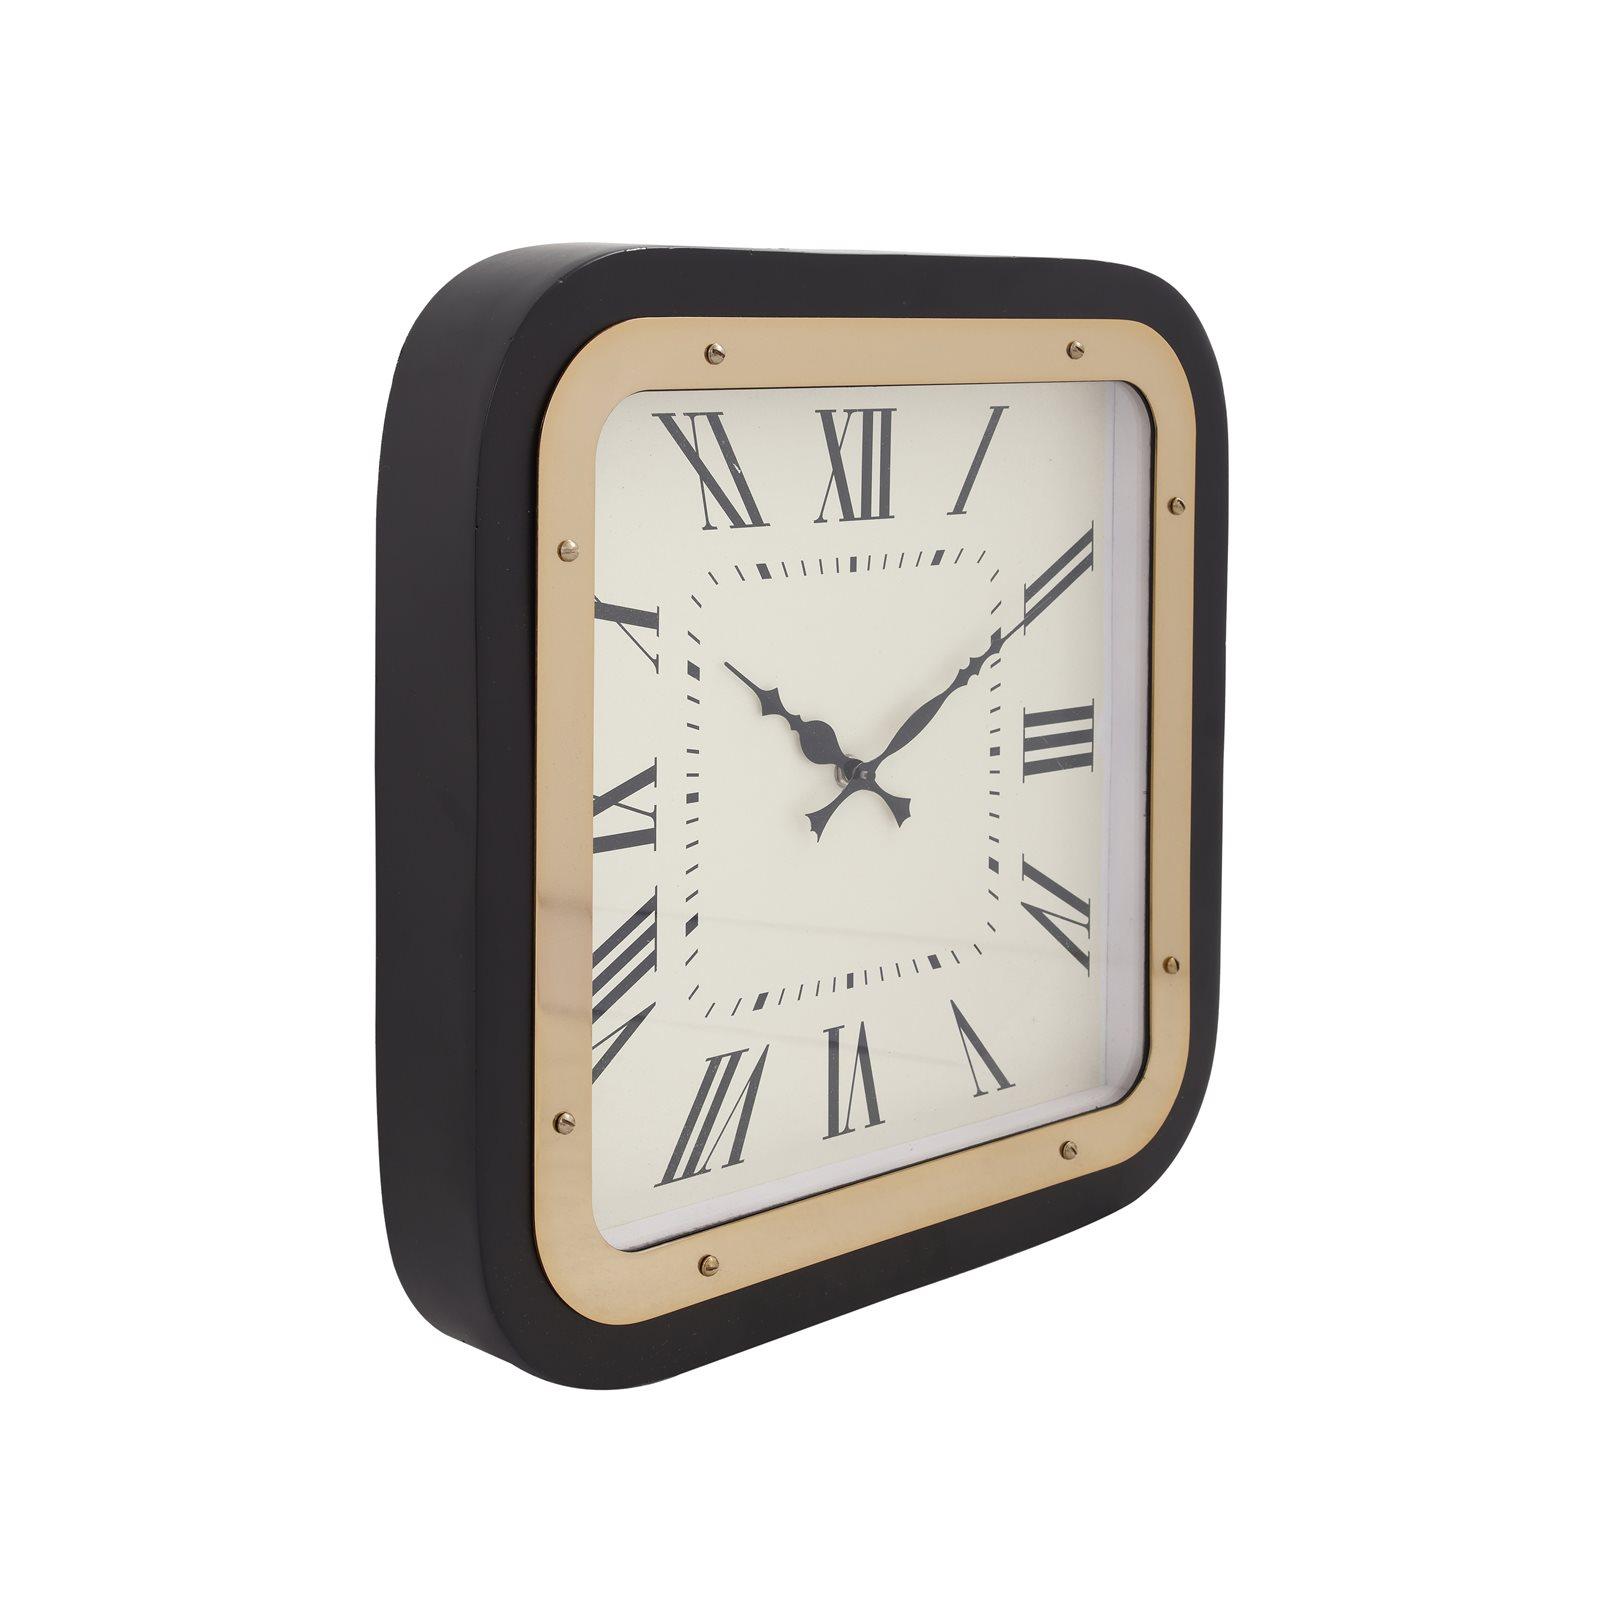 Horloge murale Or et noir 5x40x40